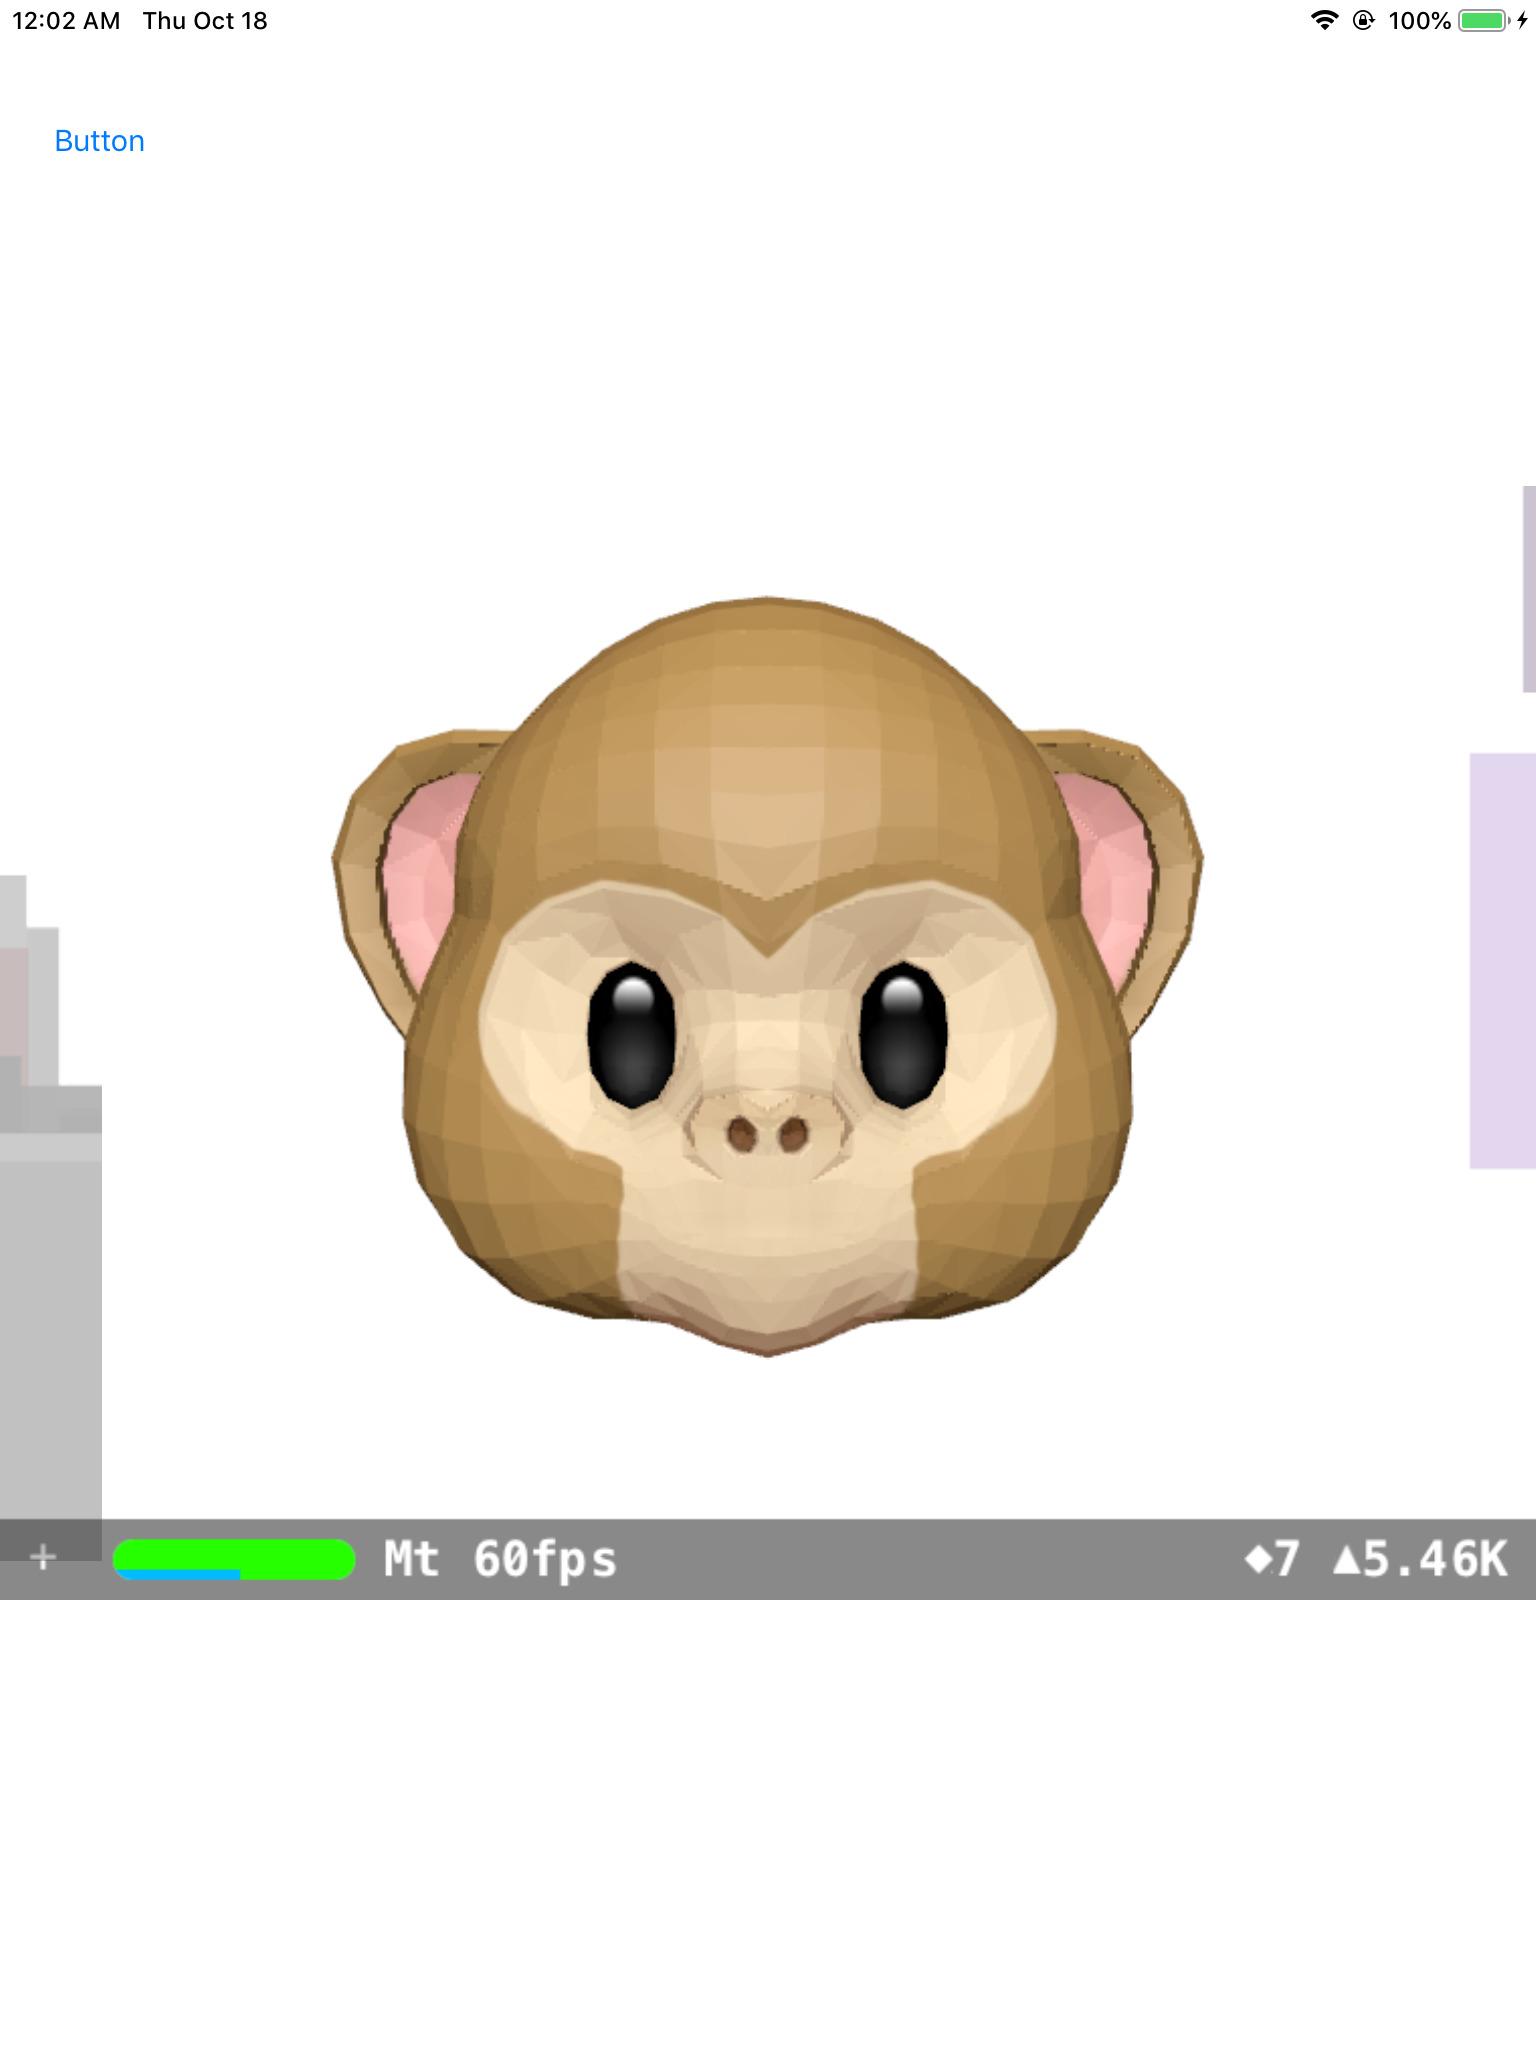 low-polygon screenshot of the Monkey Animoji